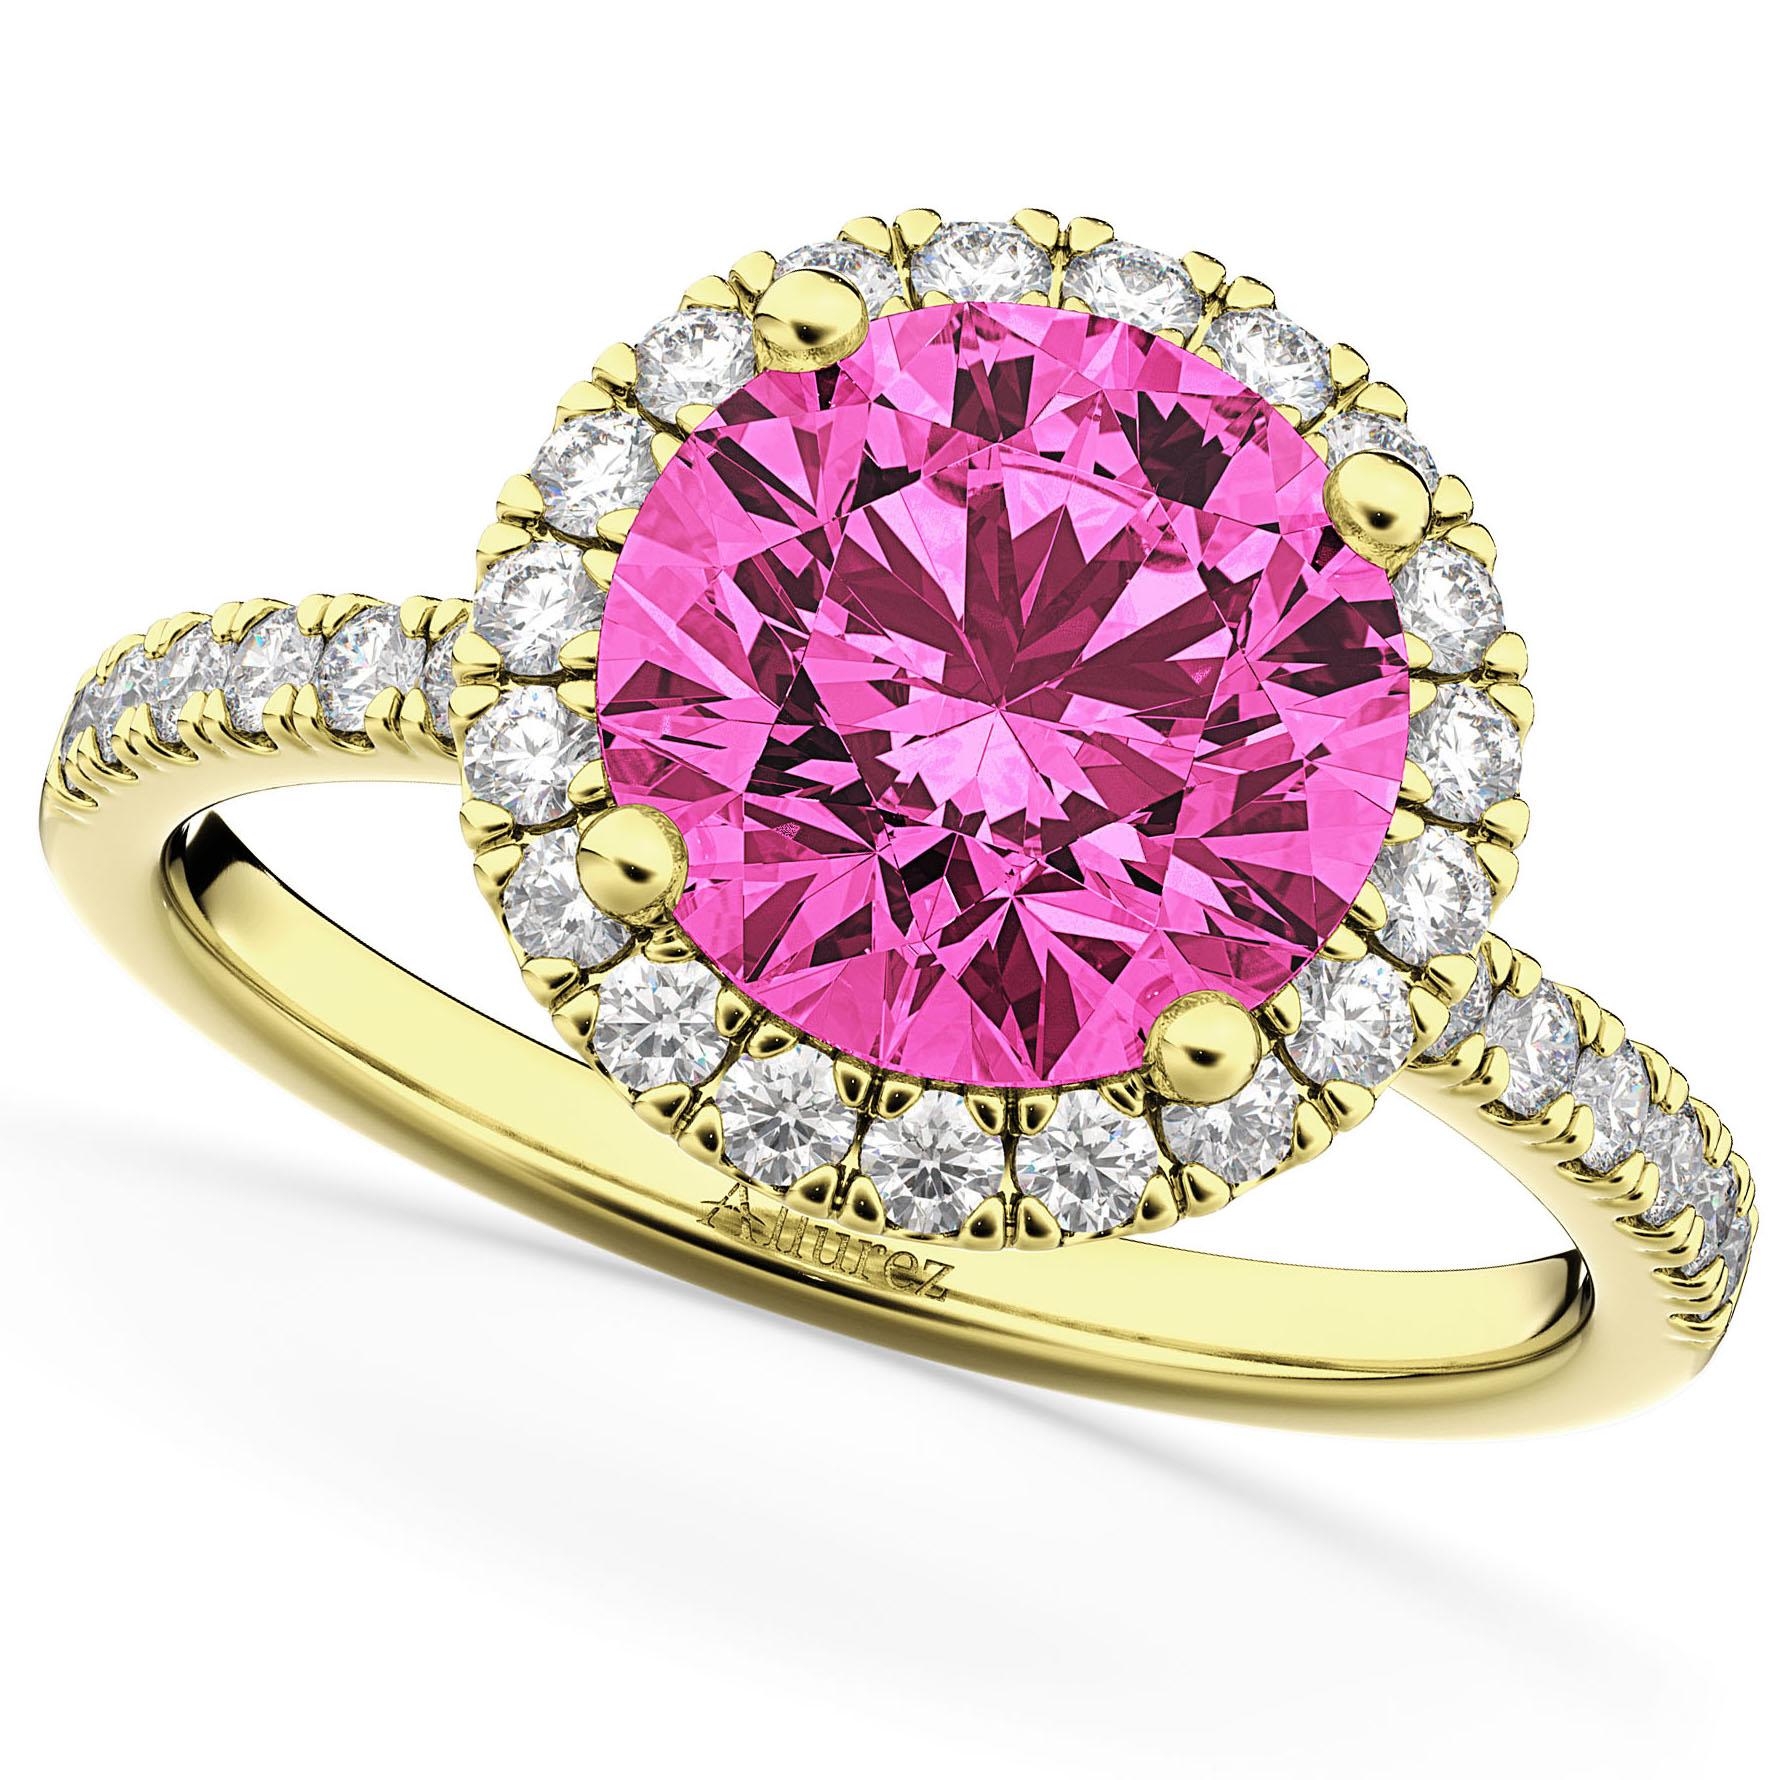 Halo Pink Tourmaline & Diamond Engagement Ring 18K Yellow Gold 2.50ct